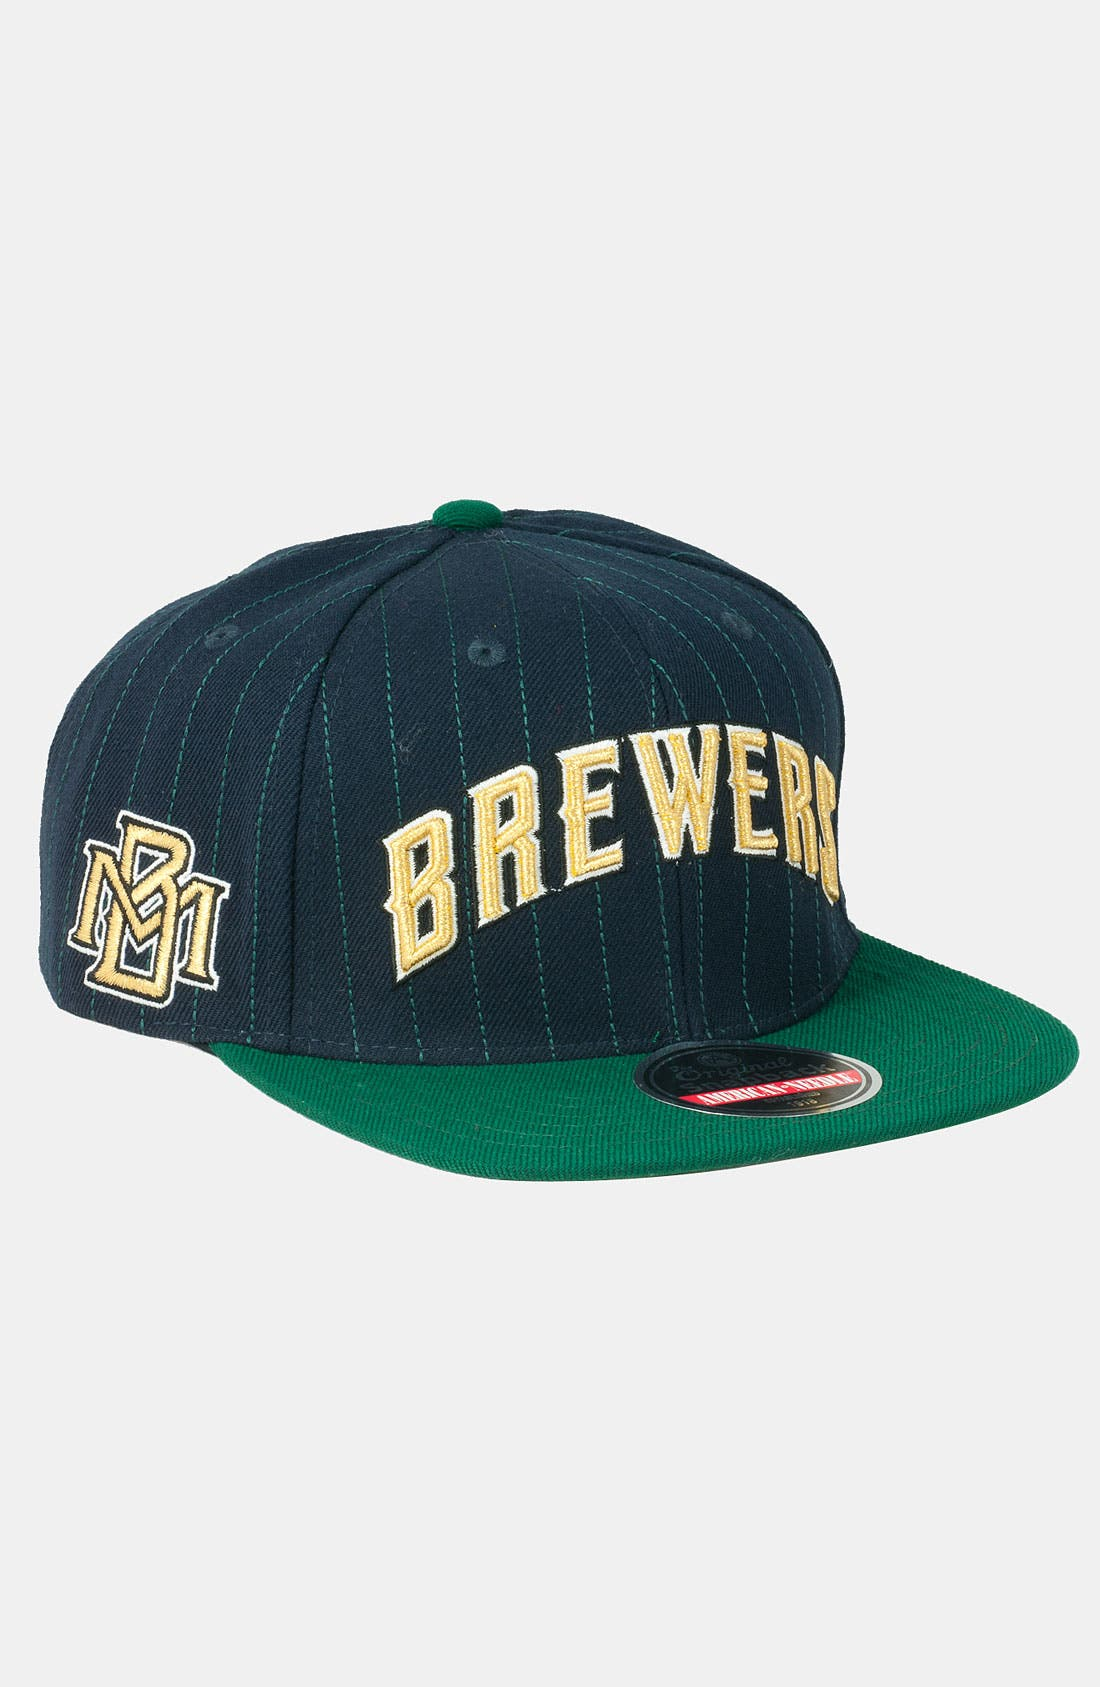 Main Image - American Needle 'Brewers' Snapback Baseball Cap